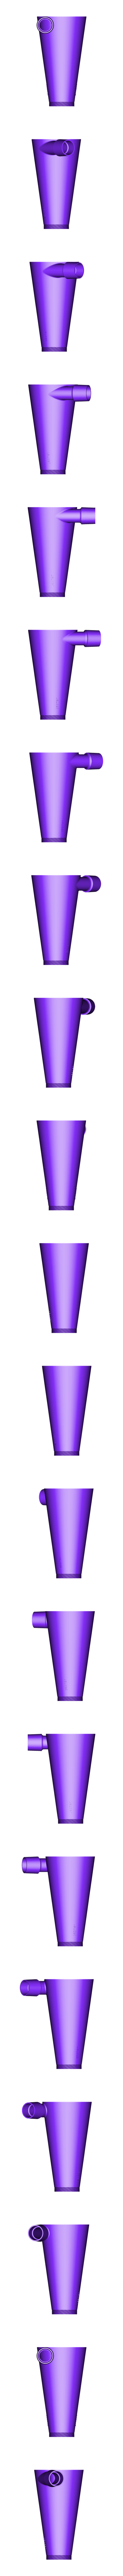 a (2).stl Download STL file 48 Head Multi Cyclone Chamber (Compact Size Added) • 3D printer model, kanadali